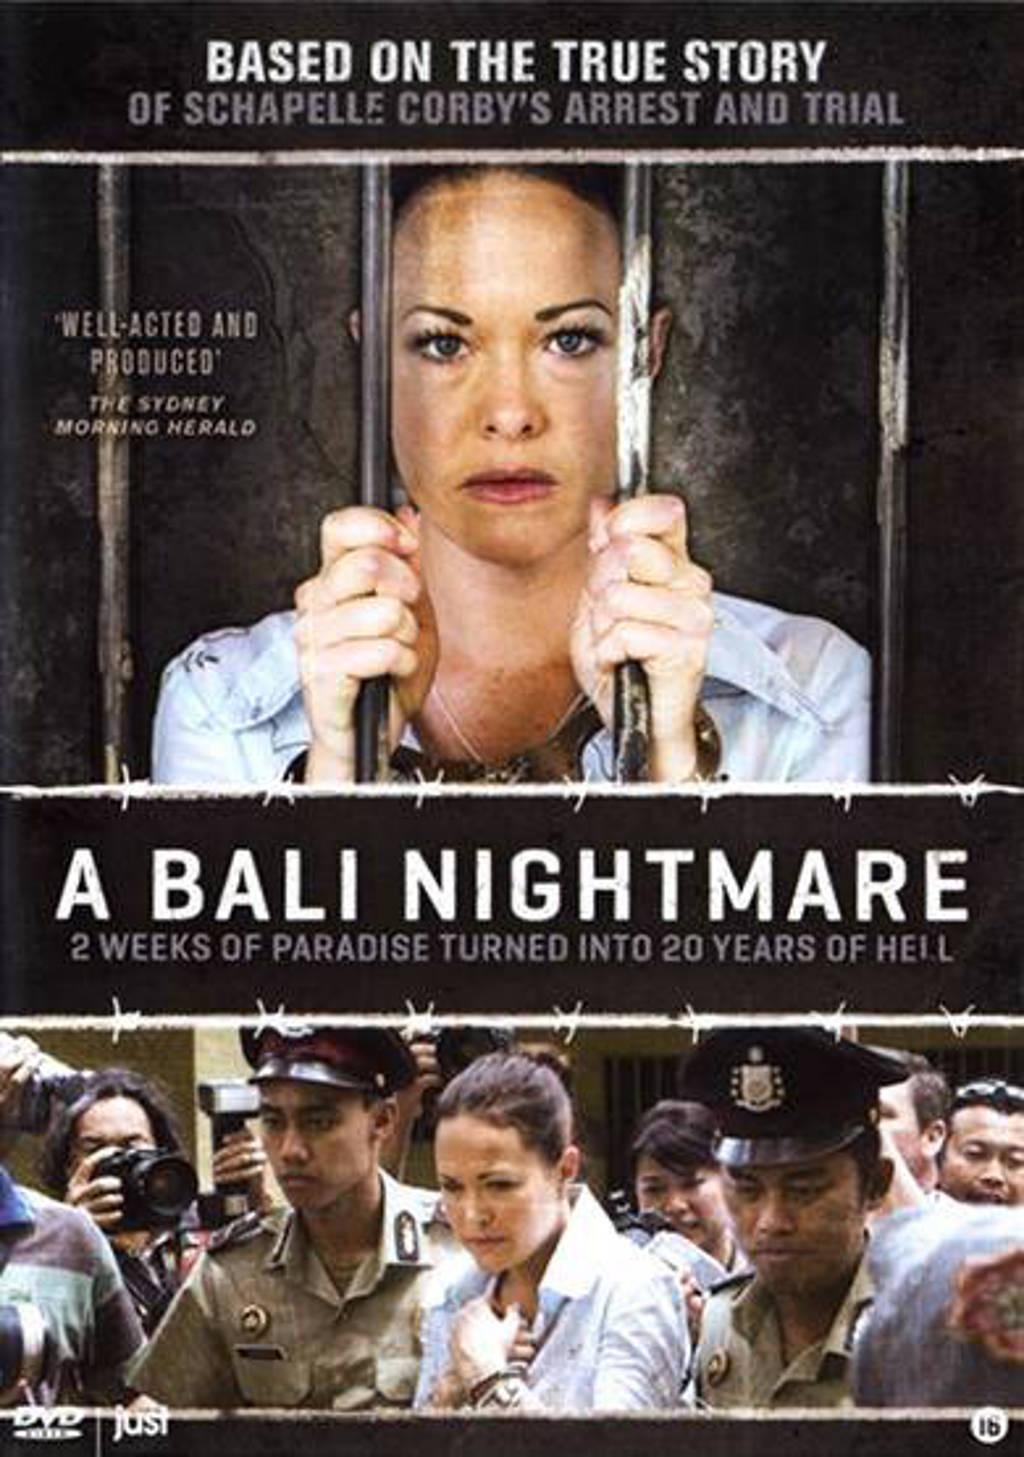 Bali nightmare (DVD)